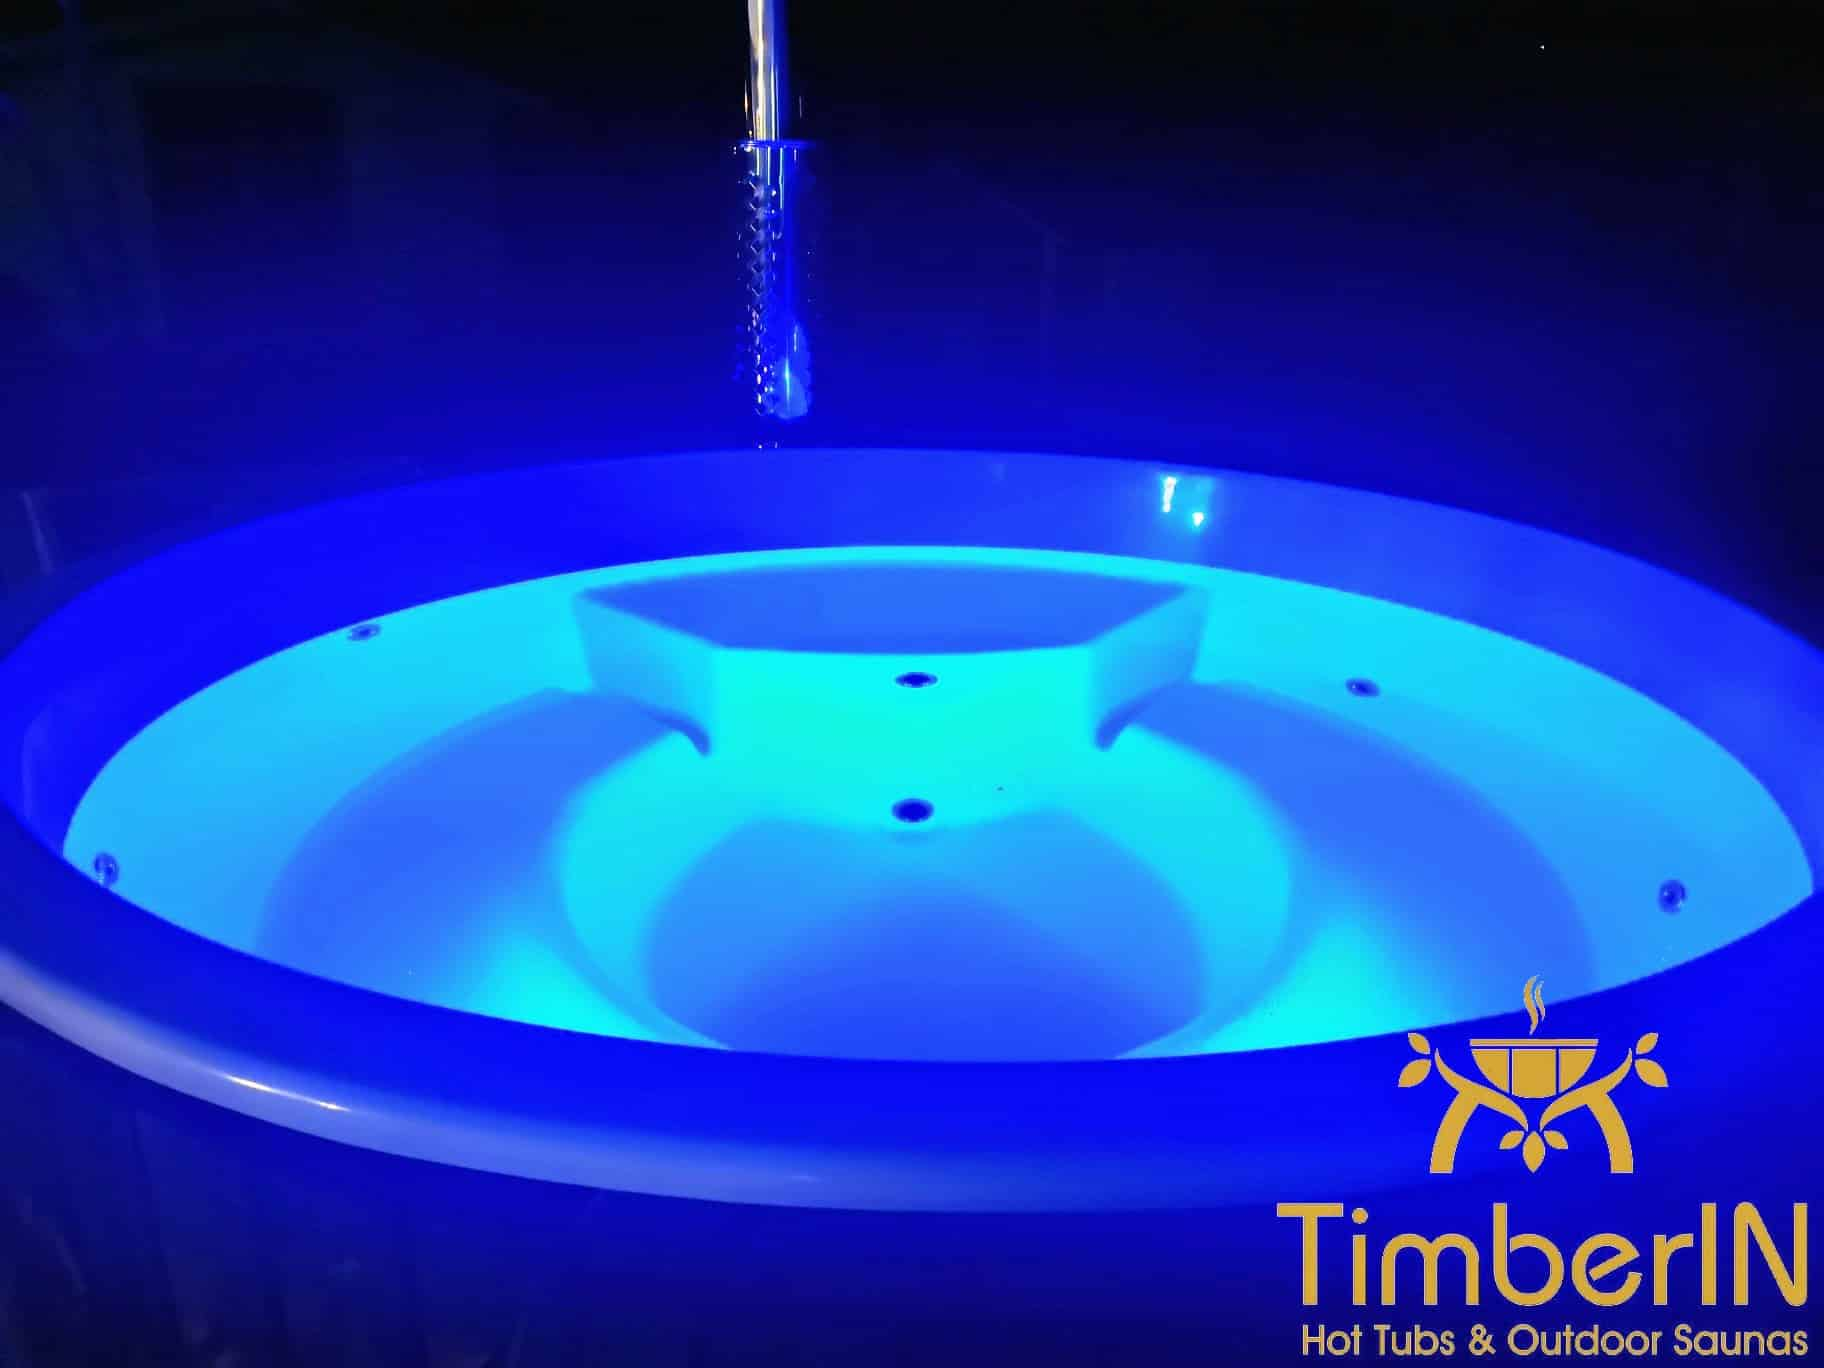 Badetonne Badebottich Hot Tube GFK mit Whirlpoolfunktion 4 1